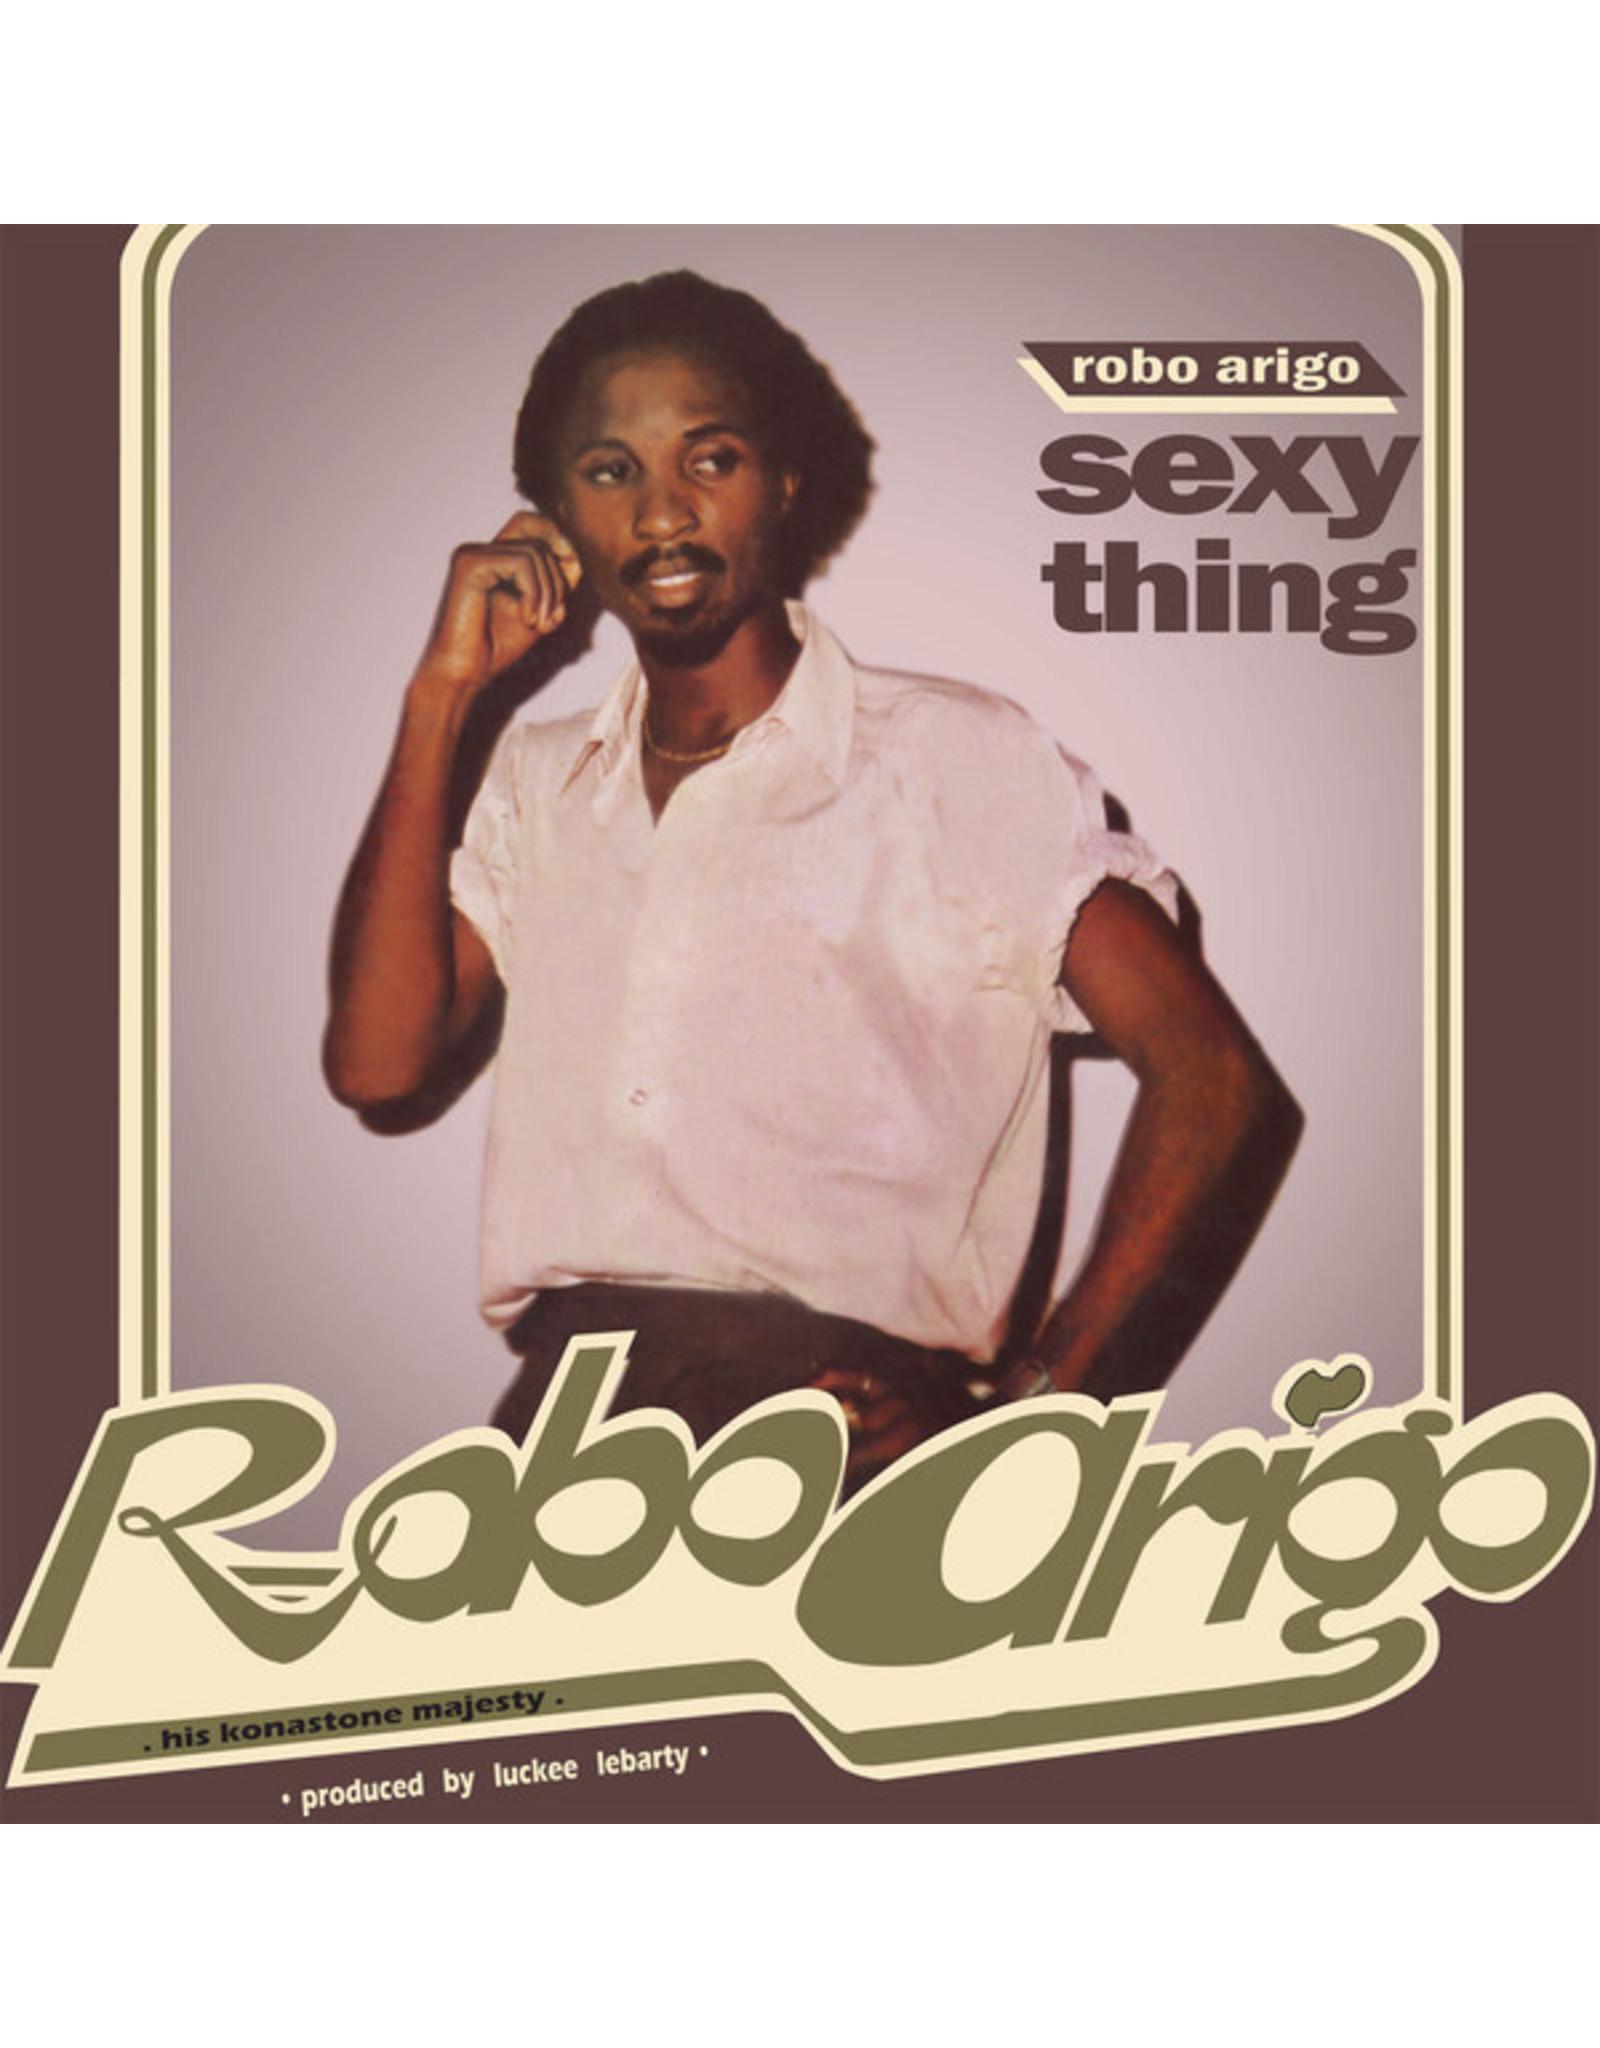 New Vinyl Robo Arigo - Sexy Thing LP